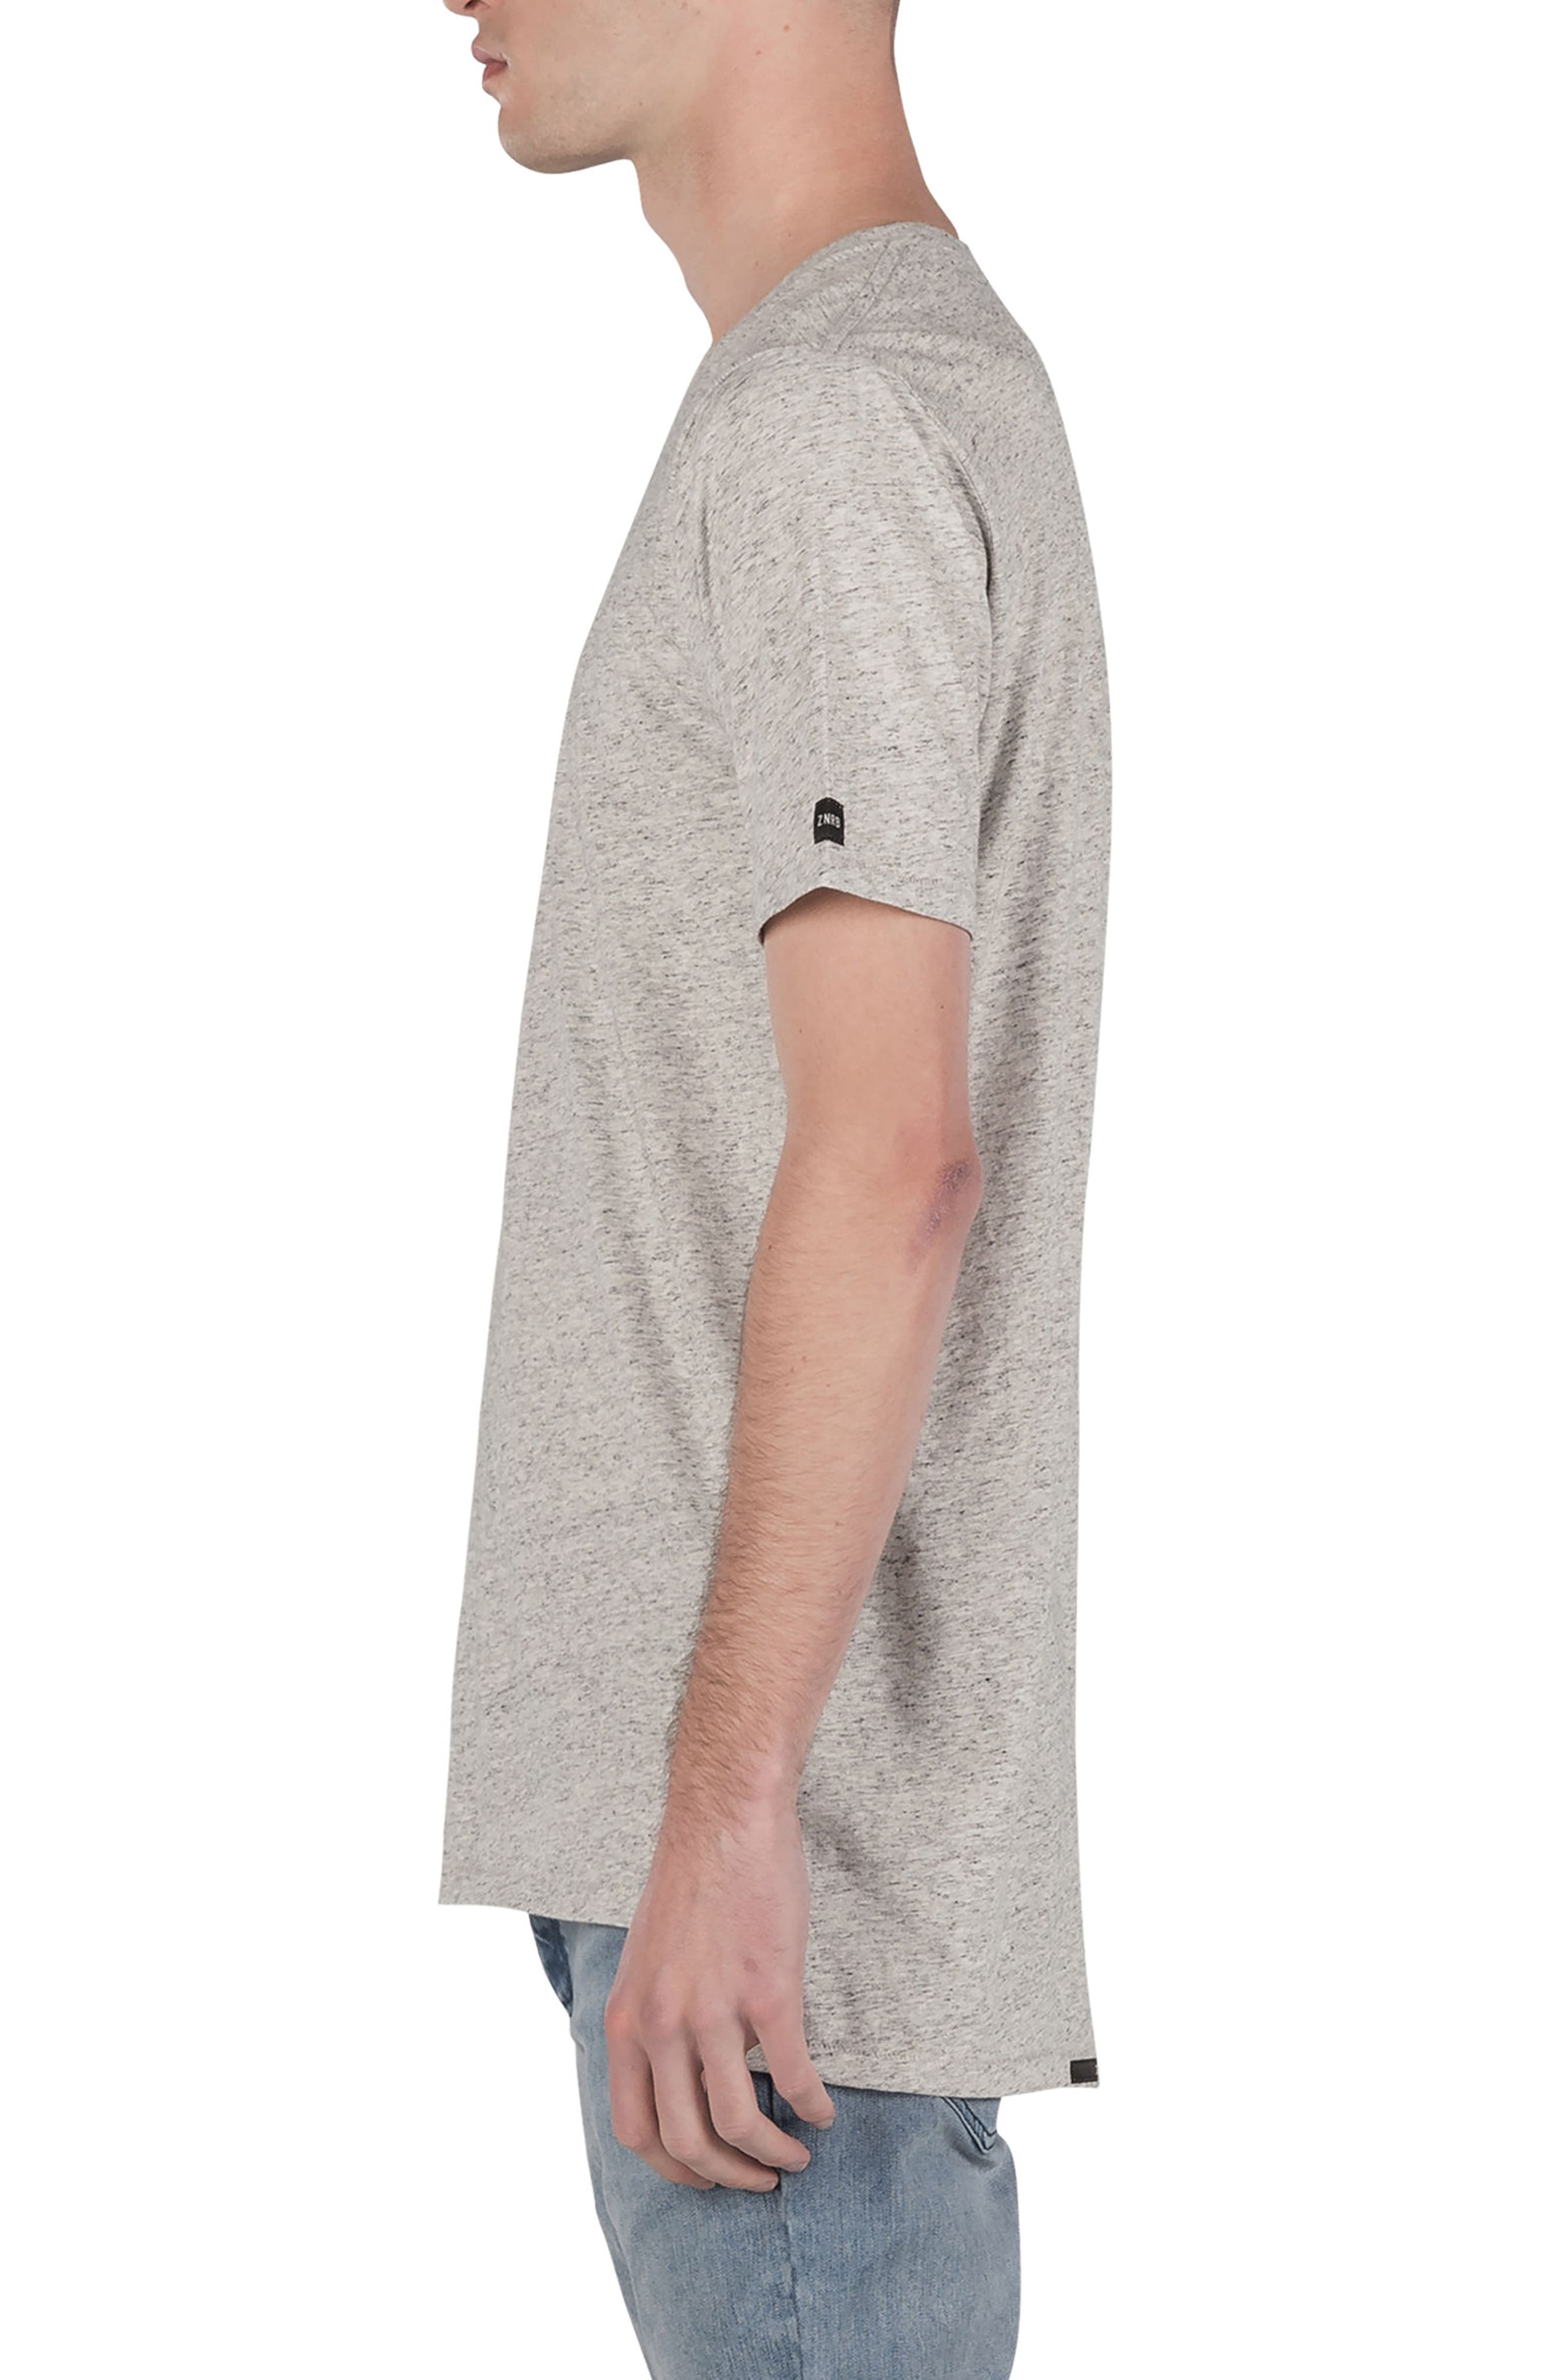 Flintlock T-Shirt,                             Alternate thumbnail 3, color,                             060